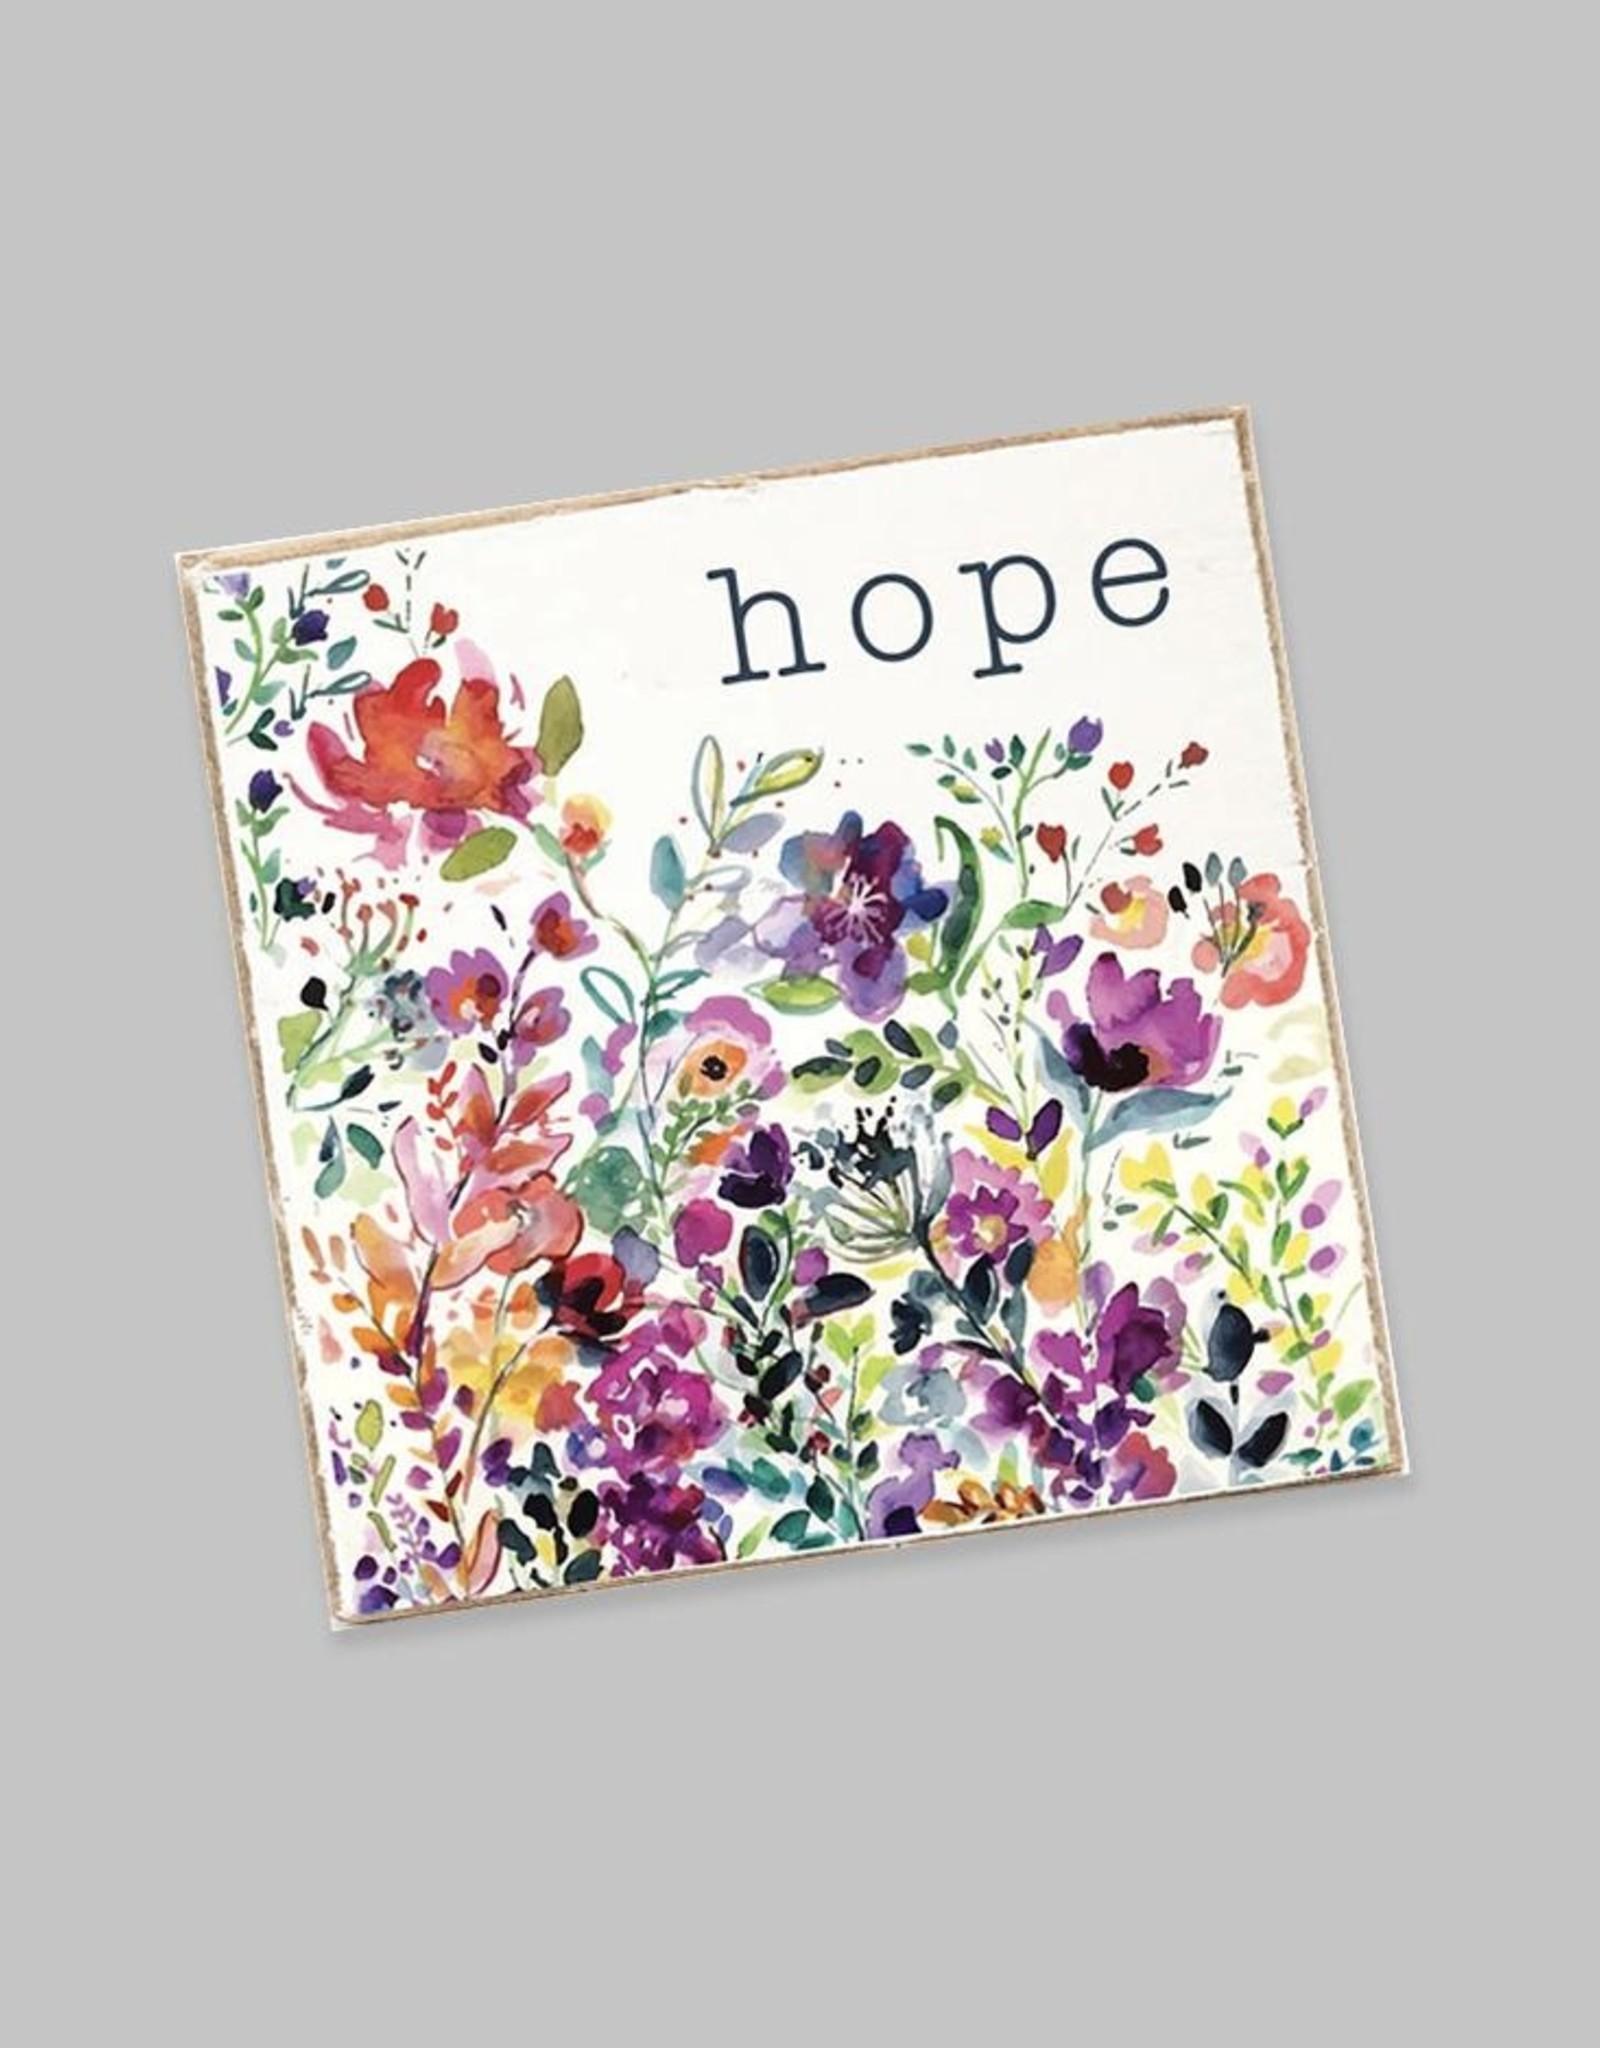 Rustic Marlin Rustic Marlin - Coaster Single - Floral Hope